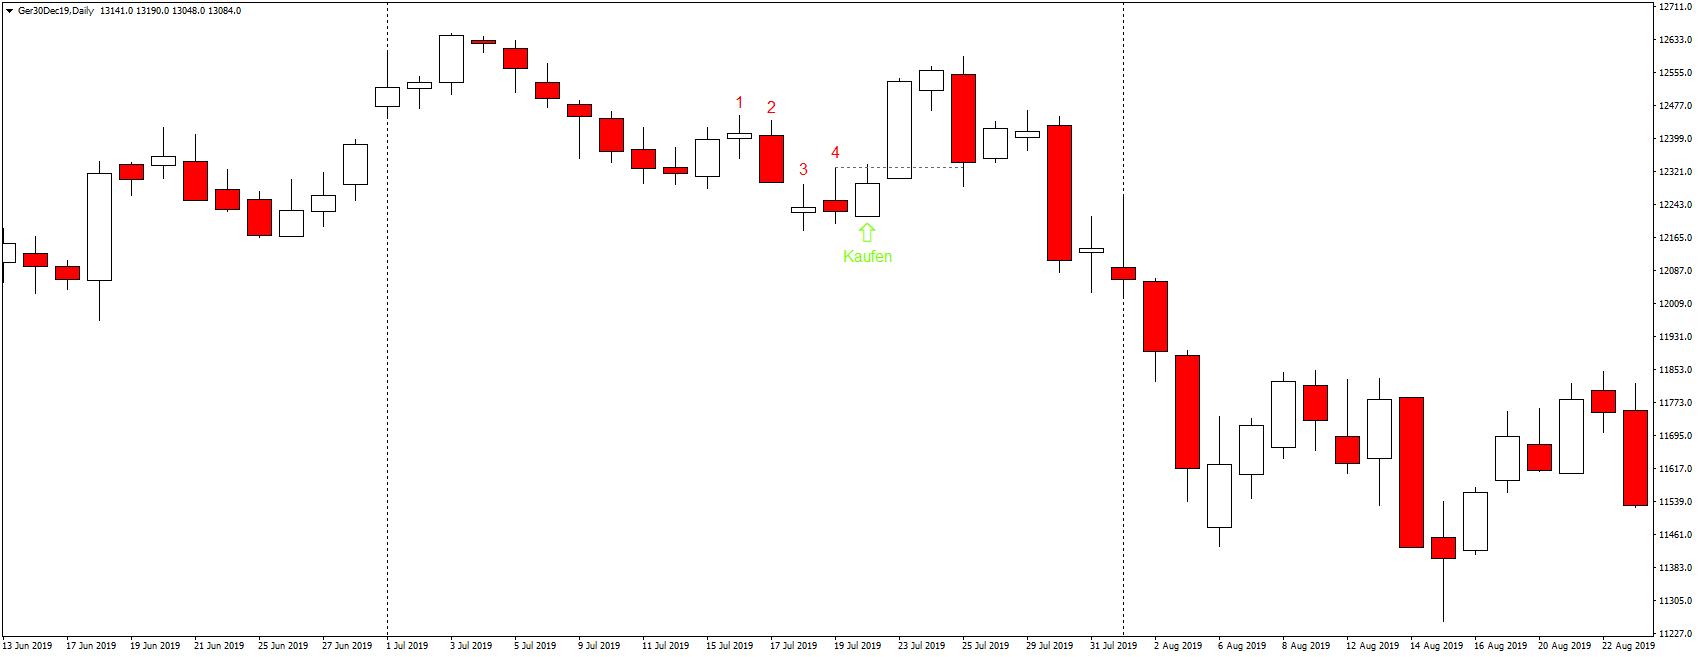 Swing Trading Strategie Rot-Weiß-Rot Beispiel